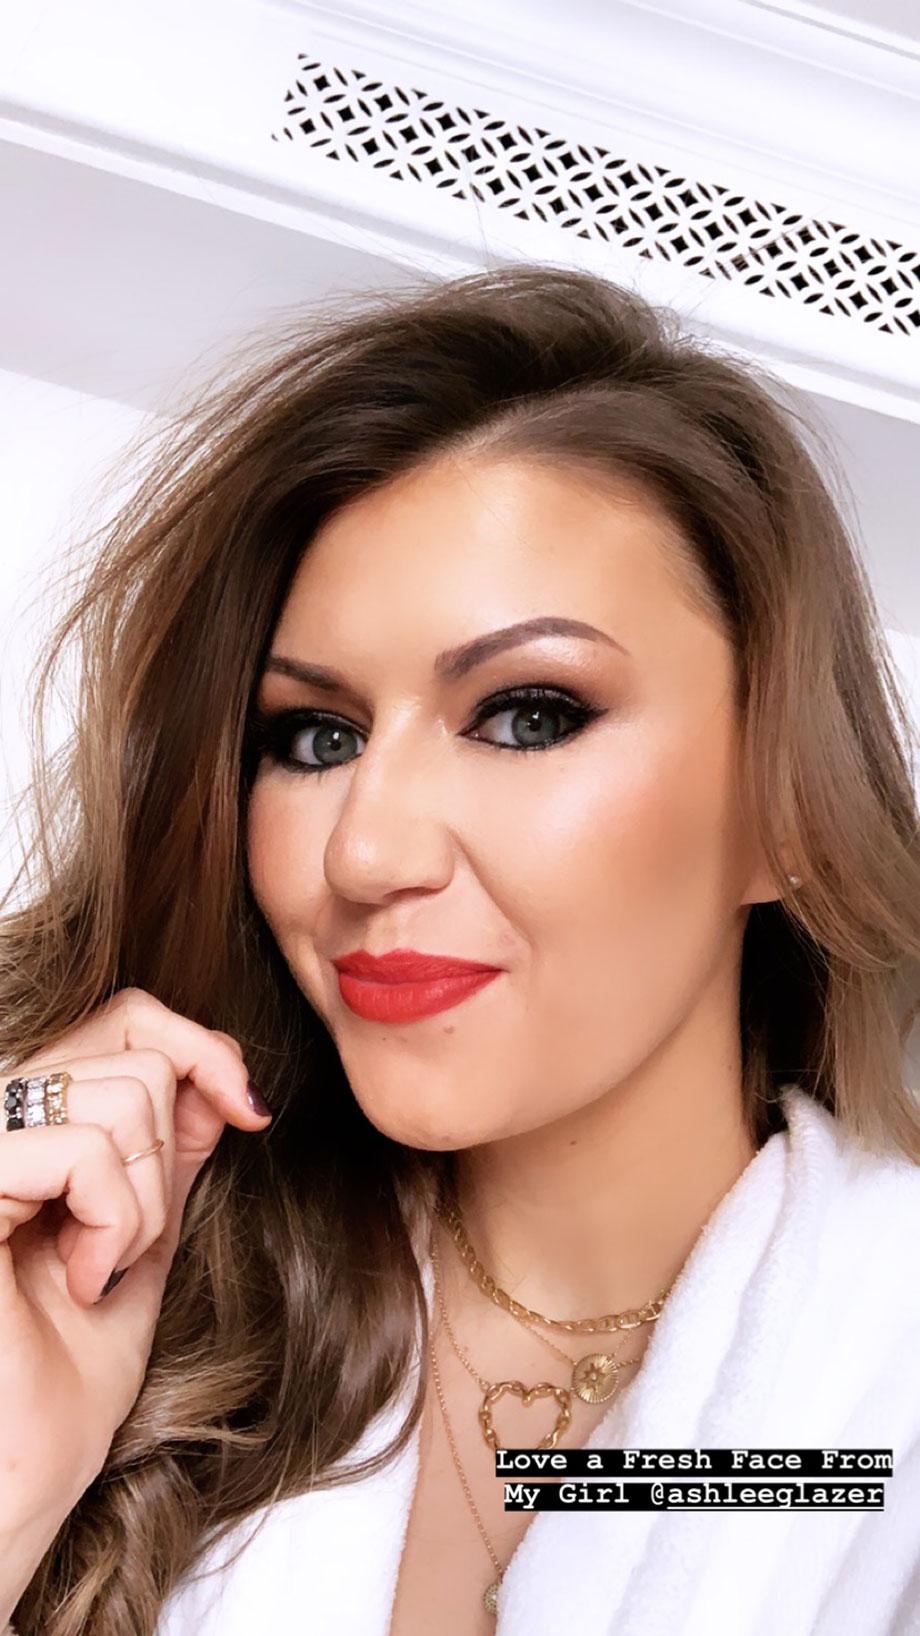 Corri McFadden has her makeup done by Ashley Glazer.